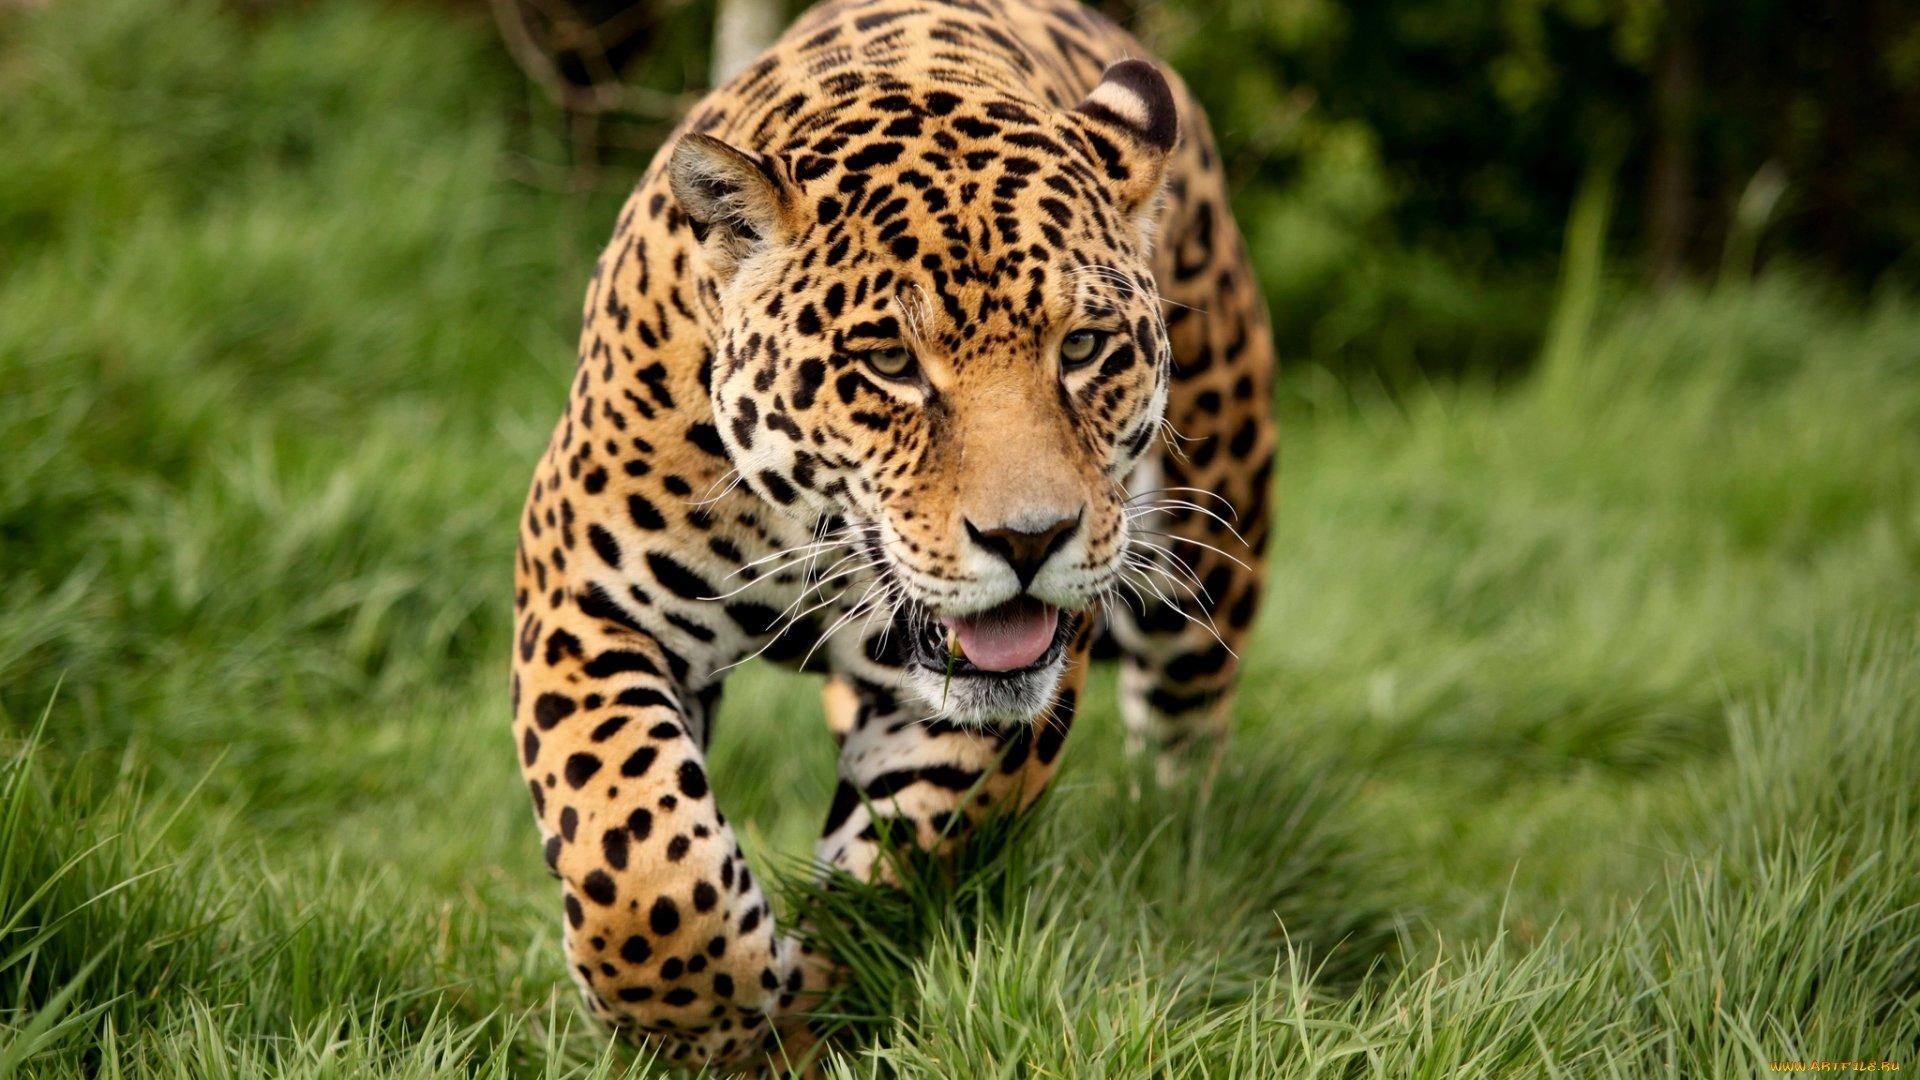 Free Jaguar High Quality Wallpaper Id 30197 For Hd 1080p Desktop